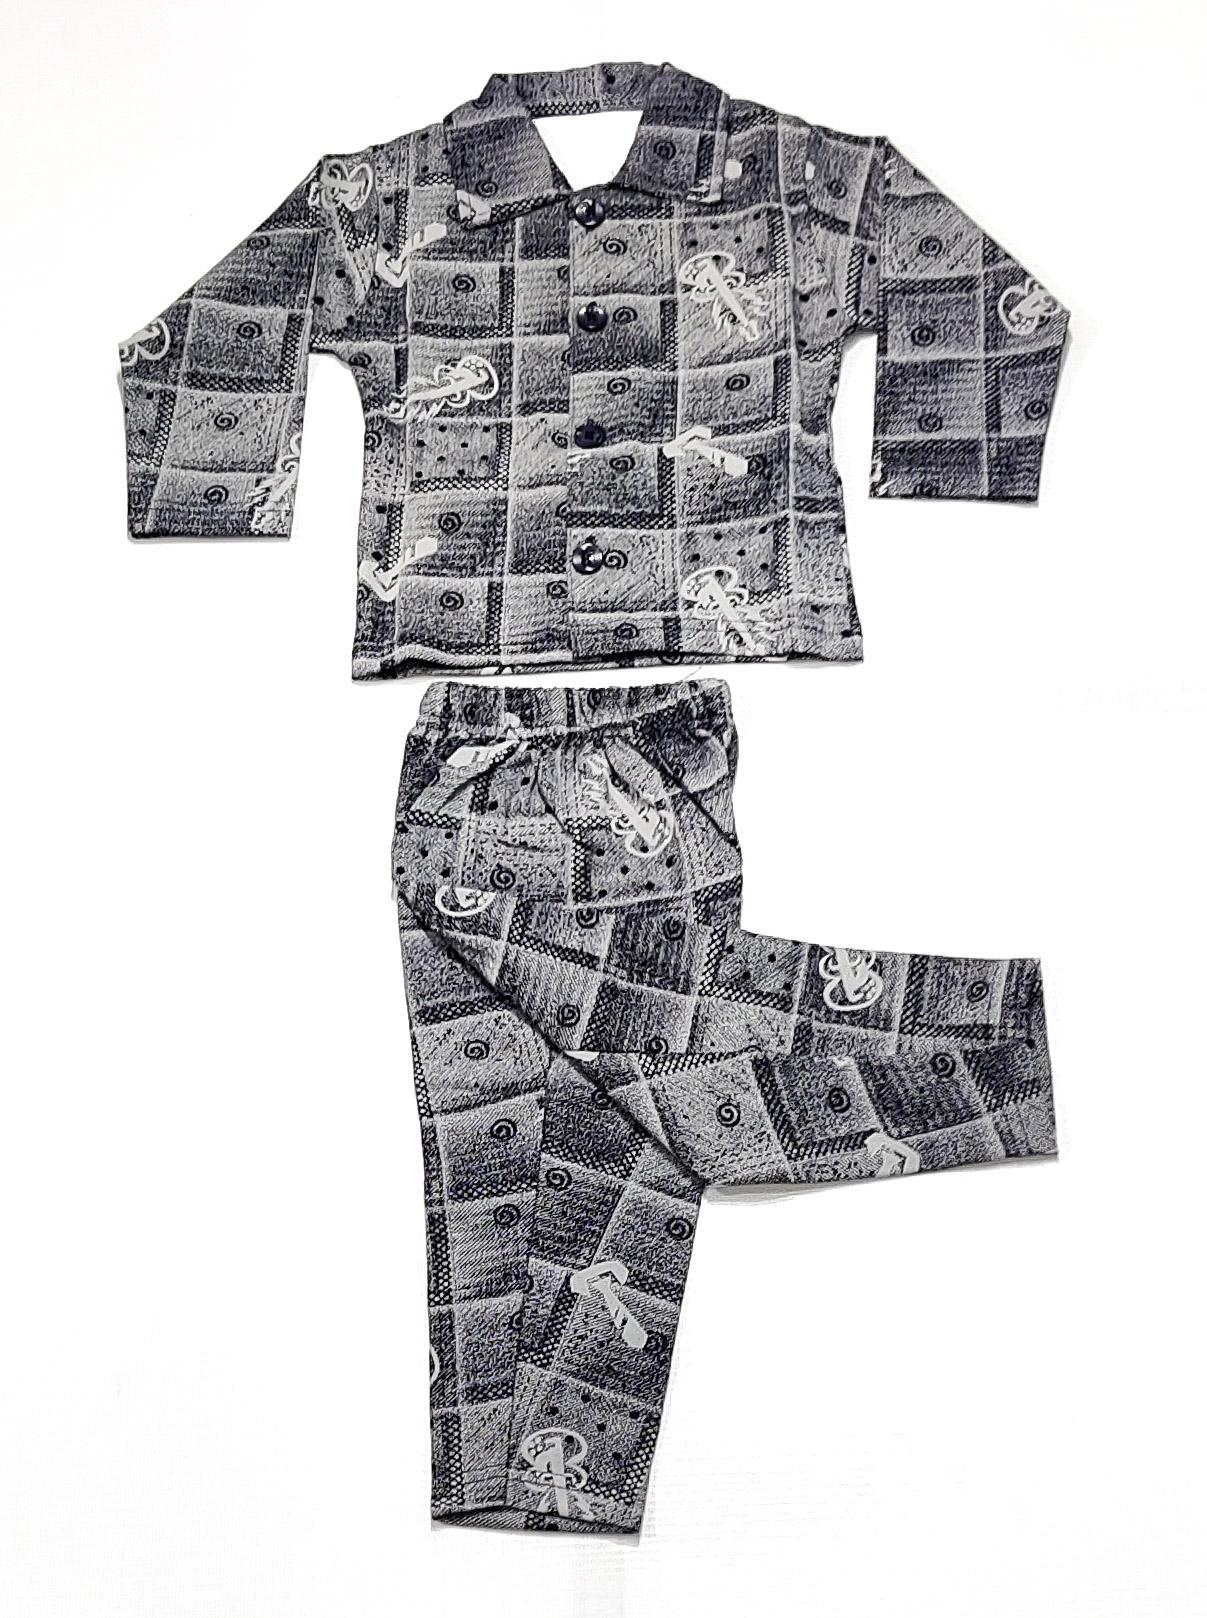 AAAKAR | Boy's Full Sleeve Pyjama Set Charcol Printed